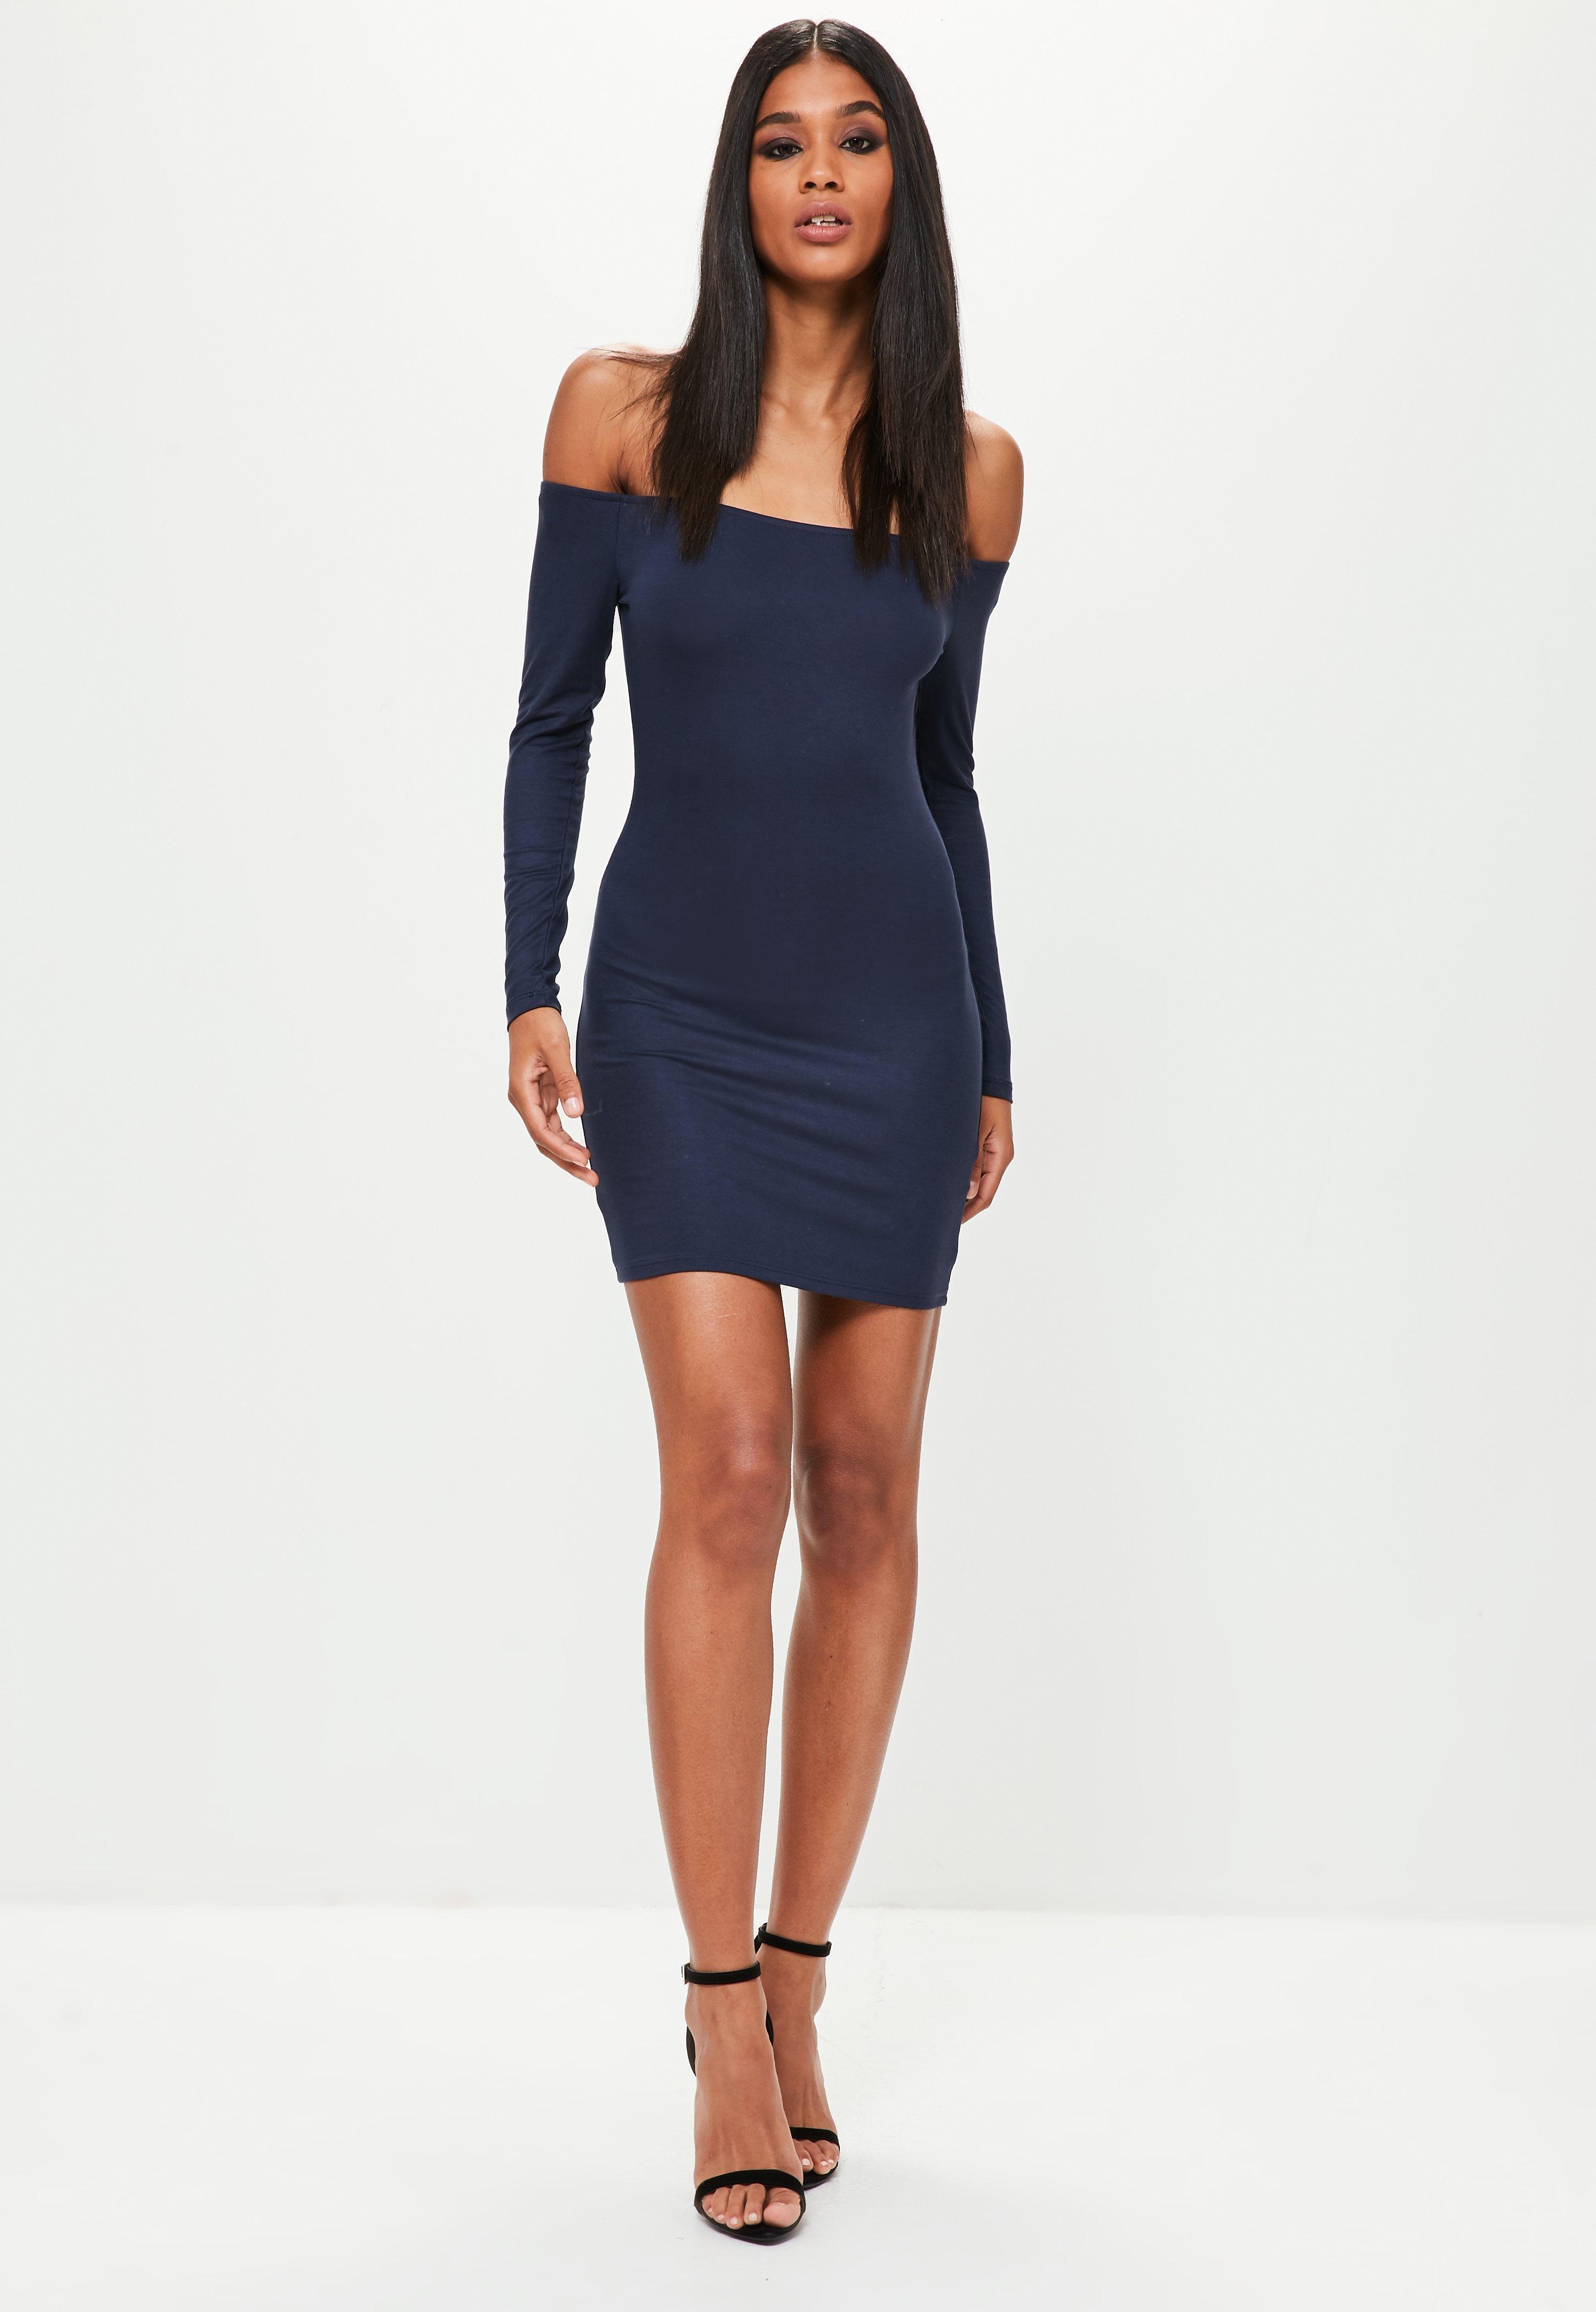 Dresses online womens online dress shop us missguided ombrellifo Gallery